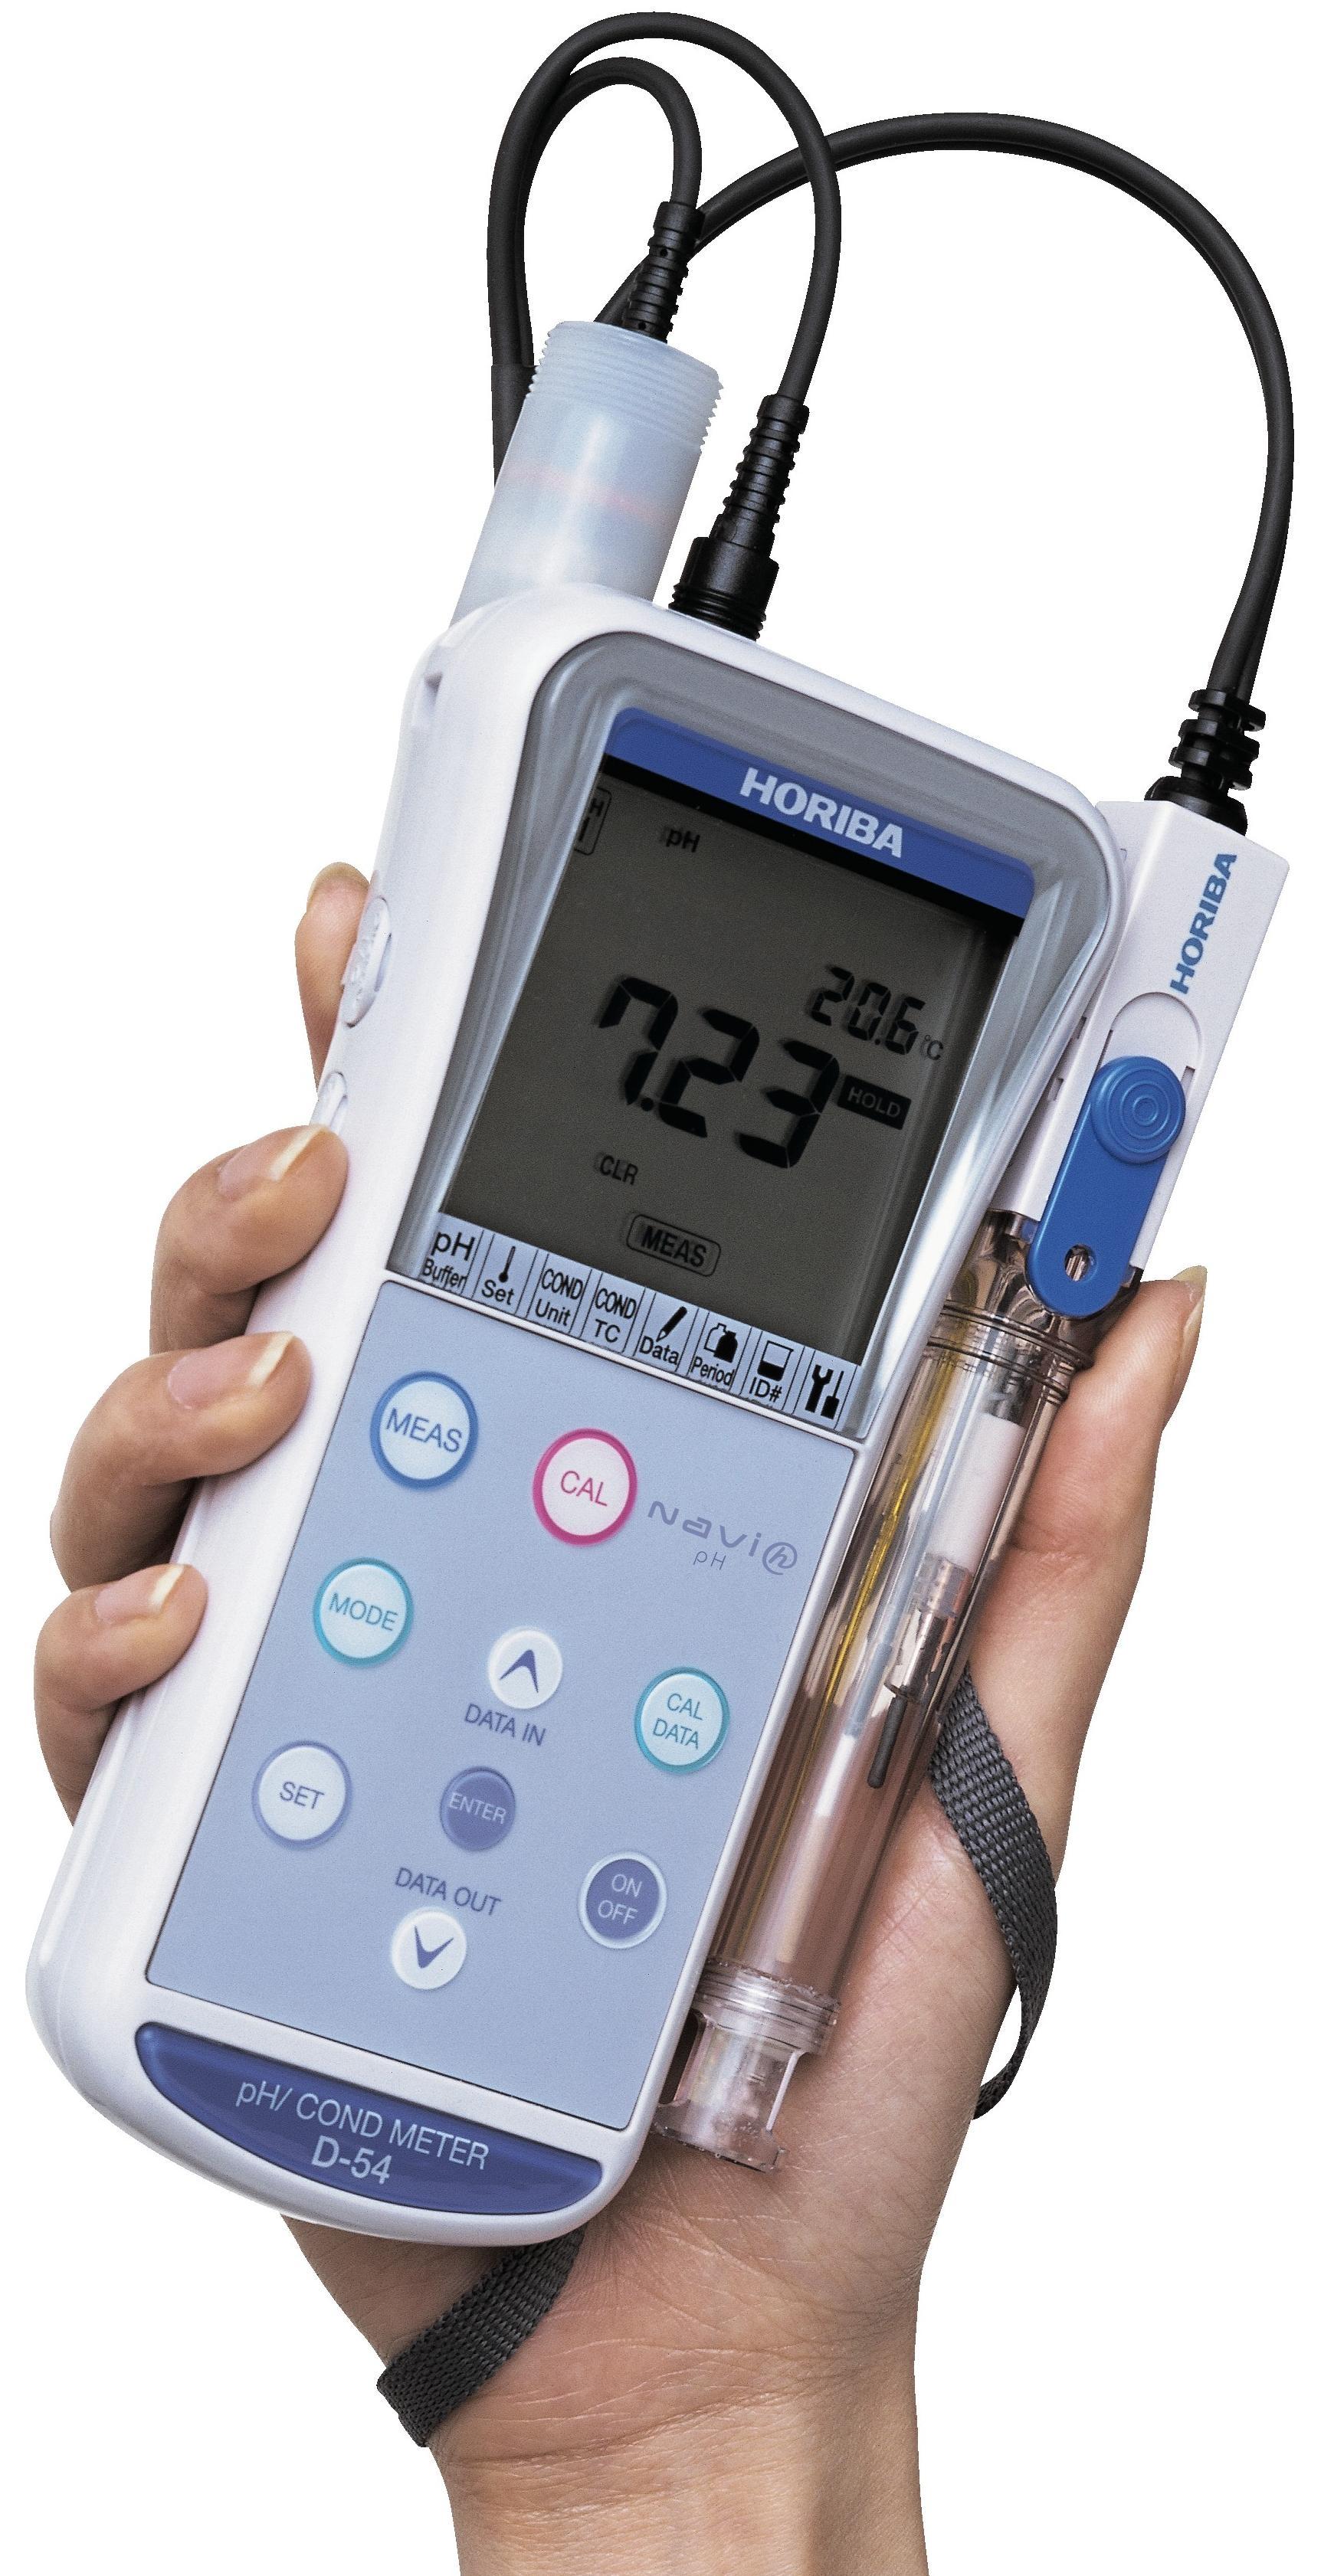 Horiba B 173 Conductivity Meter : Horiba d series handheld water quality meters